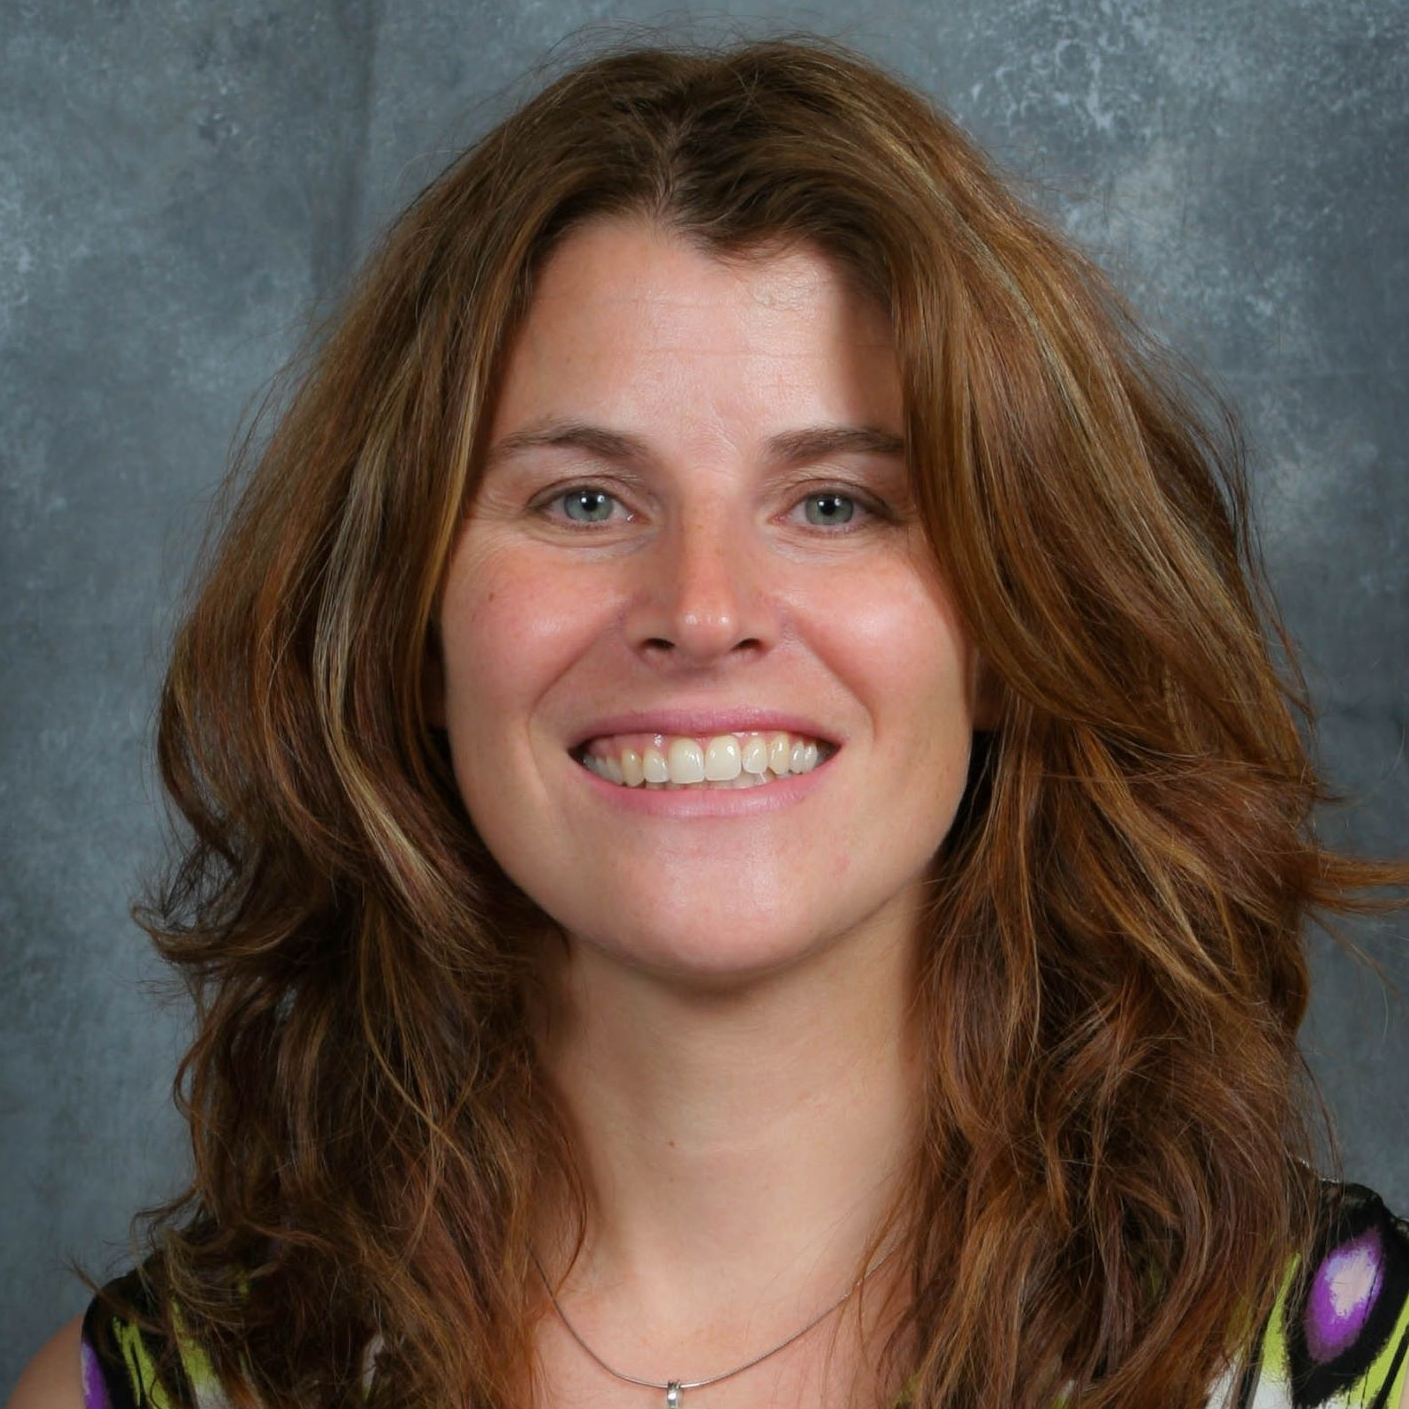 Jennifer Schoffer Closson